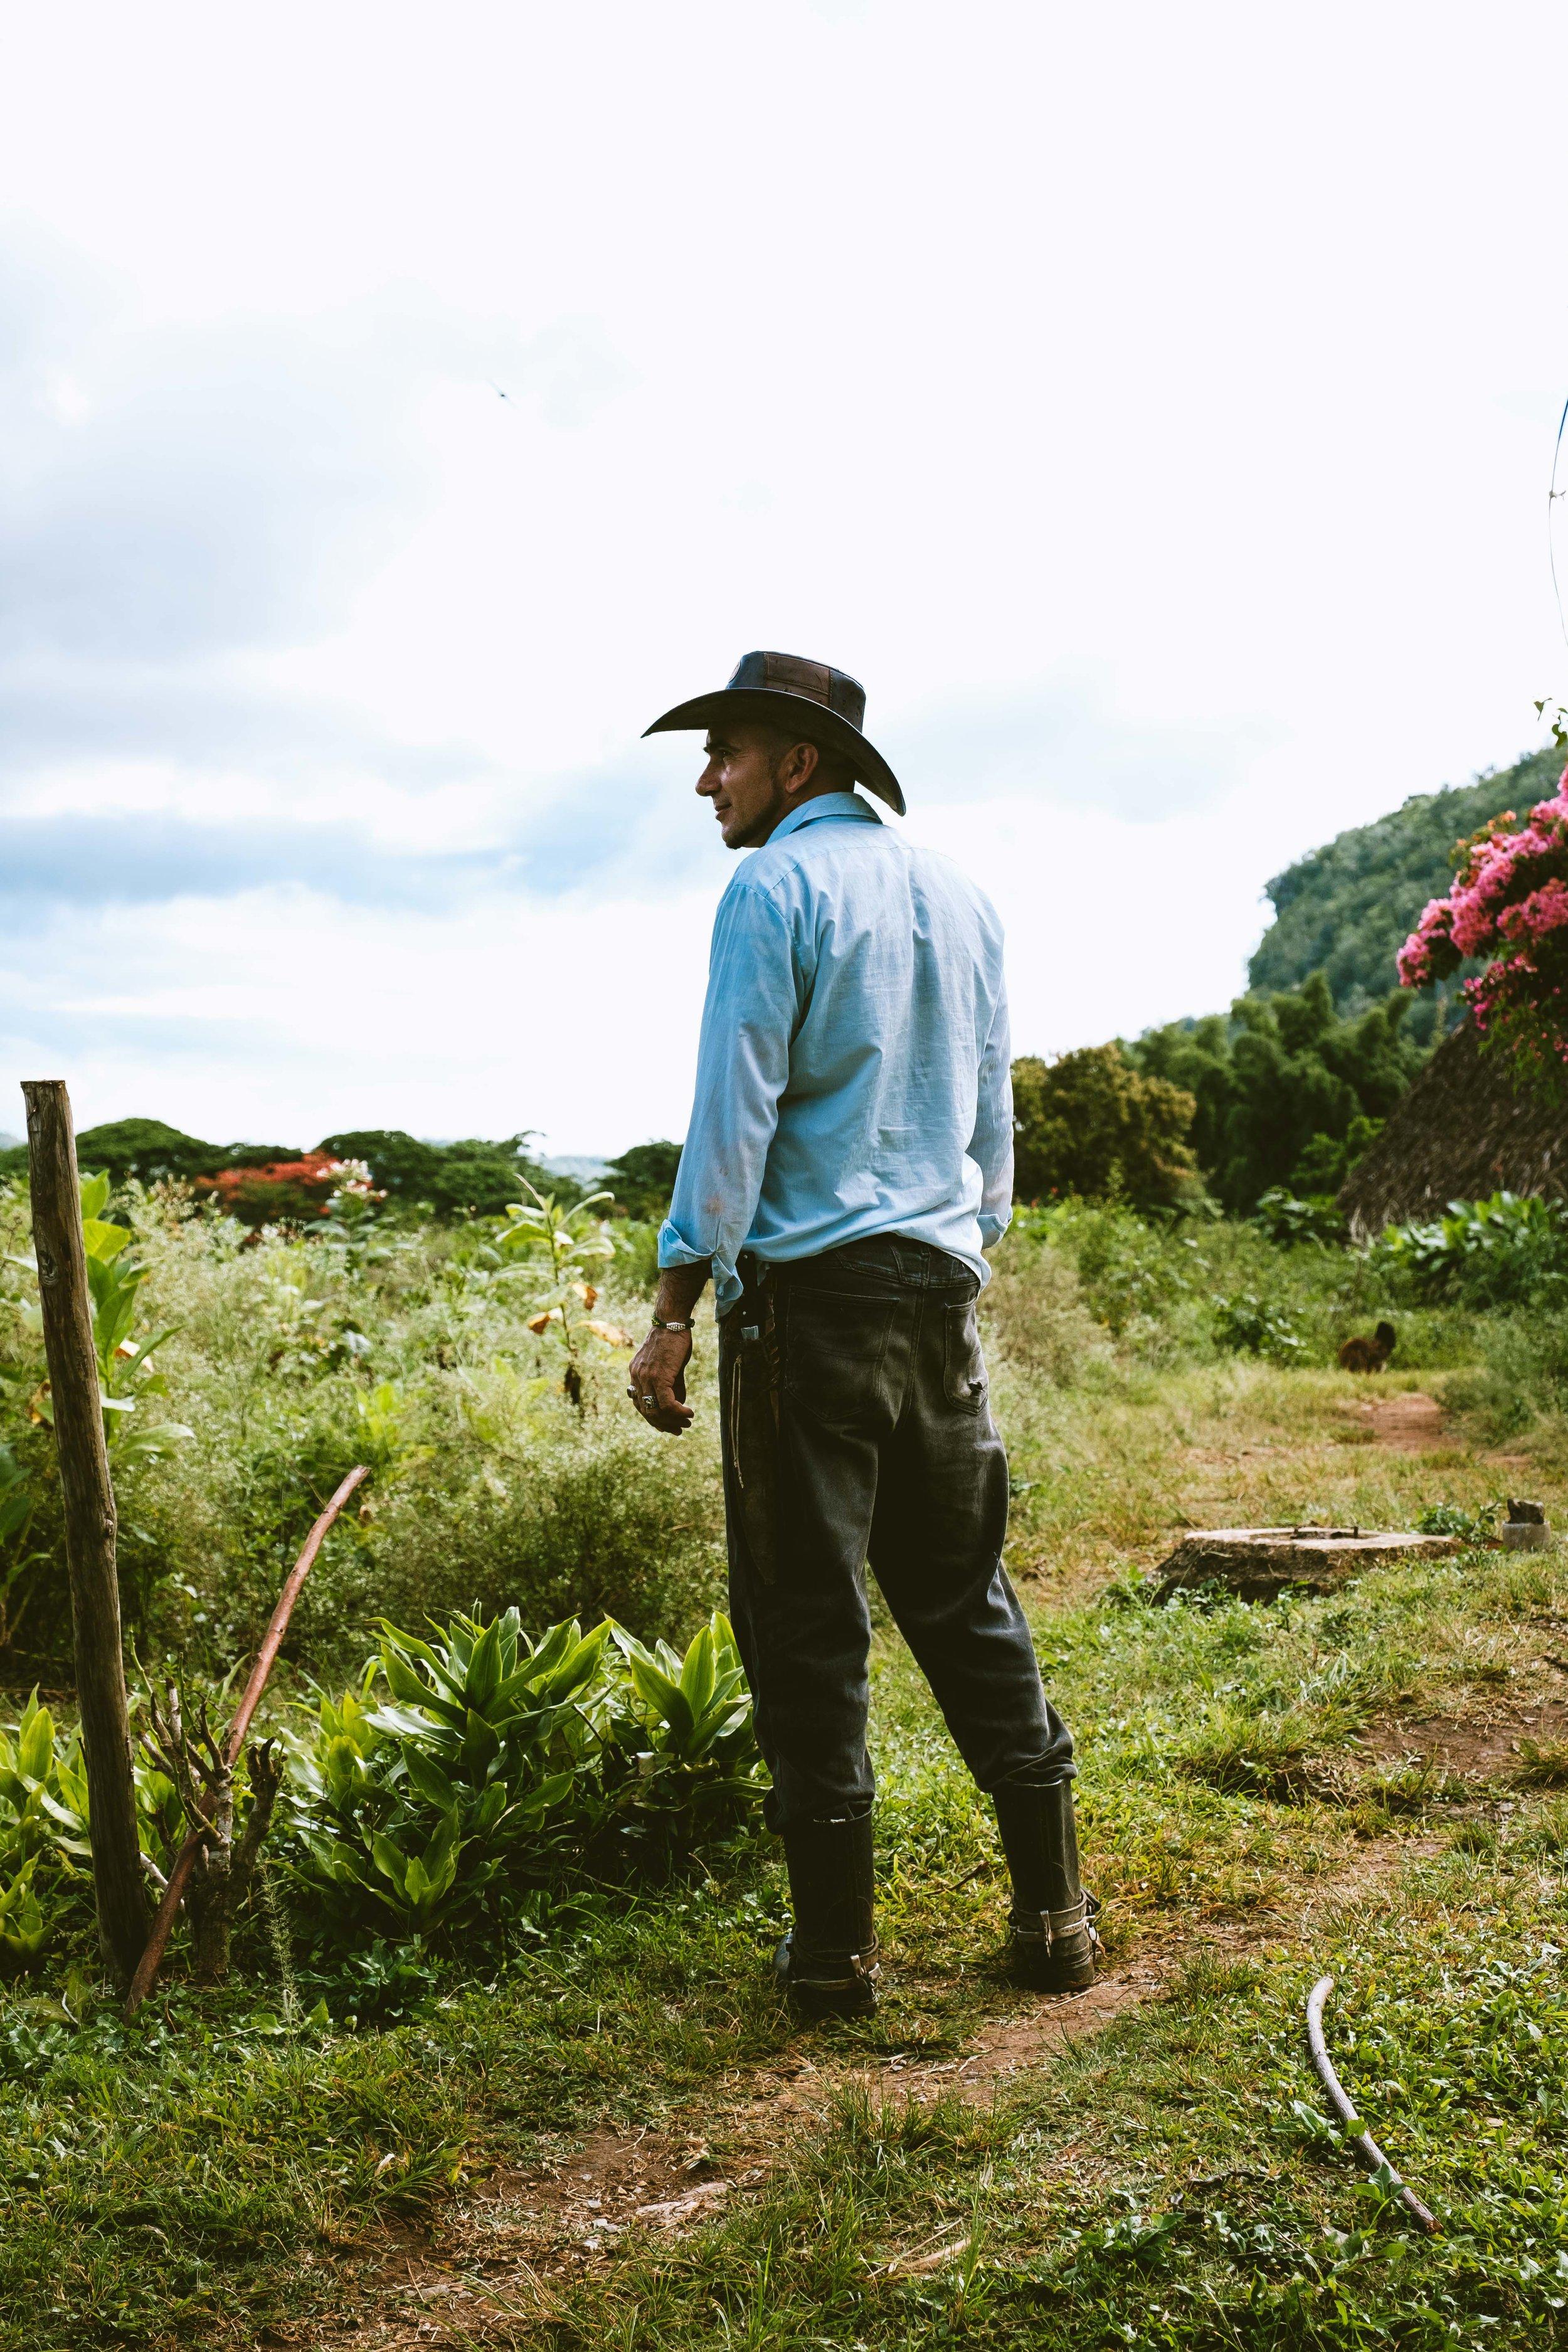 Cookwilltravel - Cuba - DSCF8492.jpg